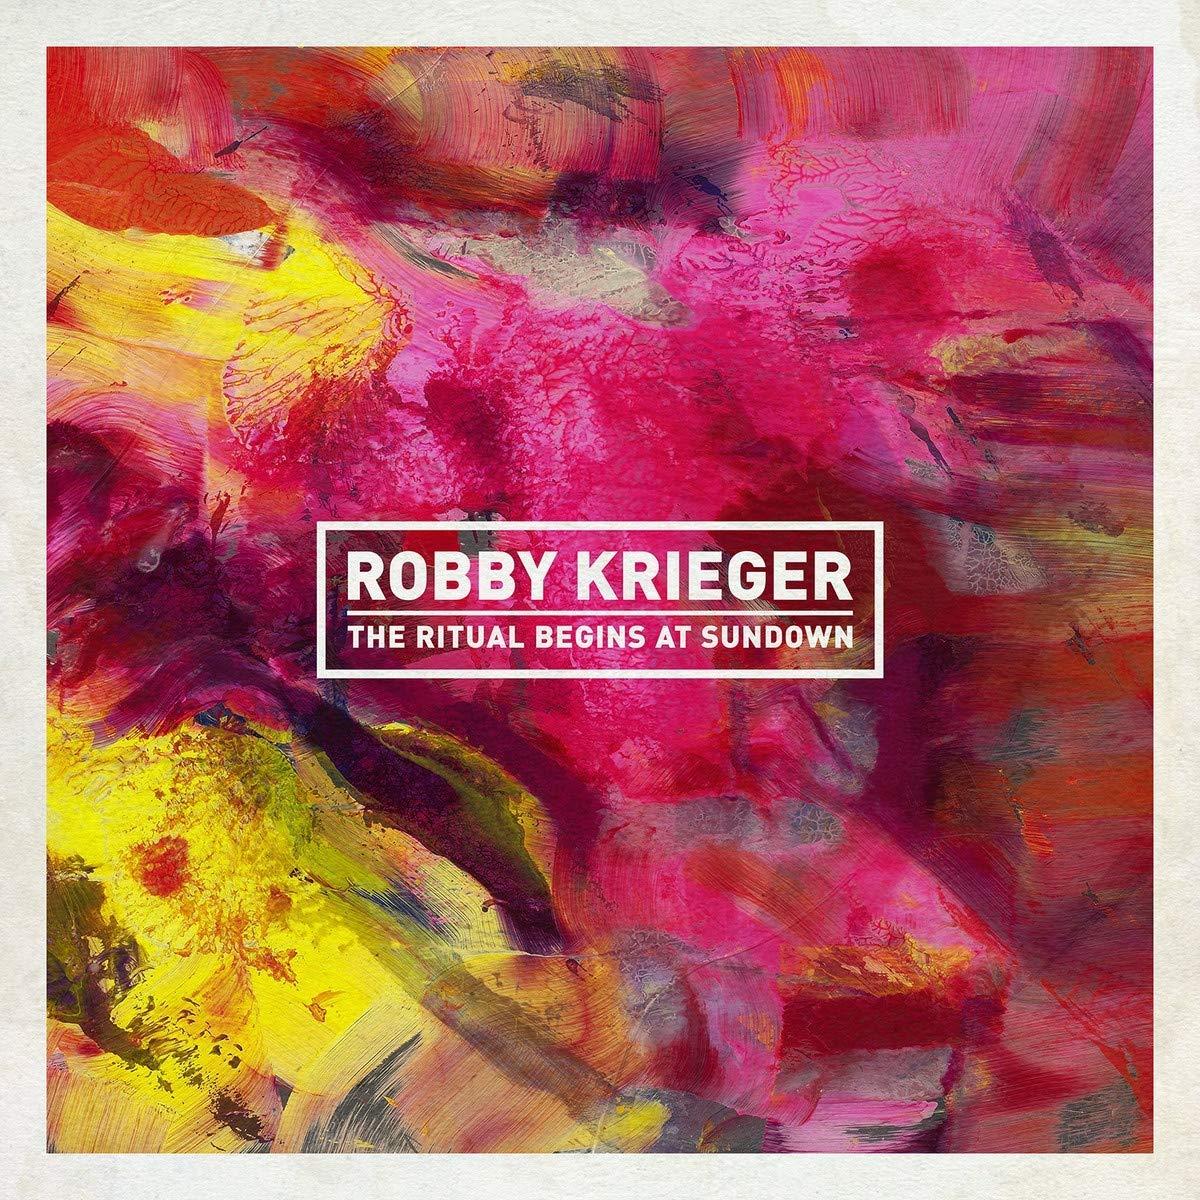 Robby Krieger - The Ritual Begins At Sundown [LP]